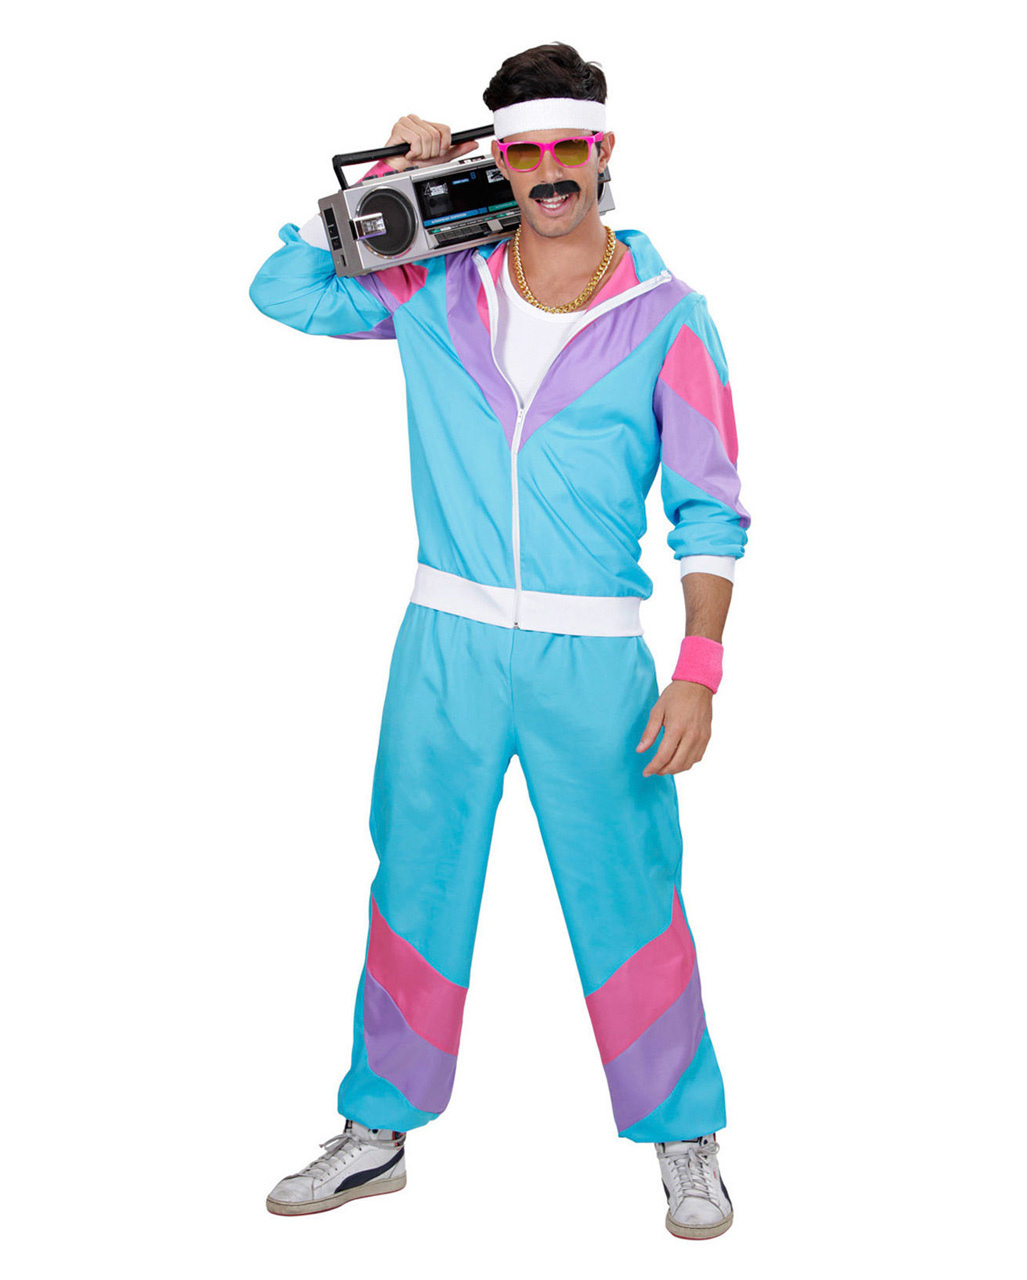 80s Jogging Suit Men Costume As Carnival Costume Karneval Universe